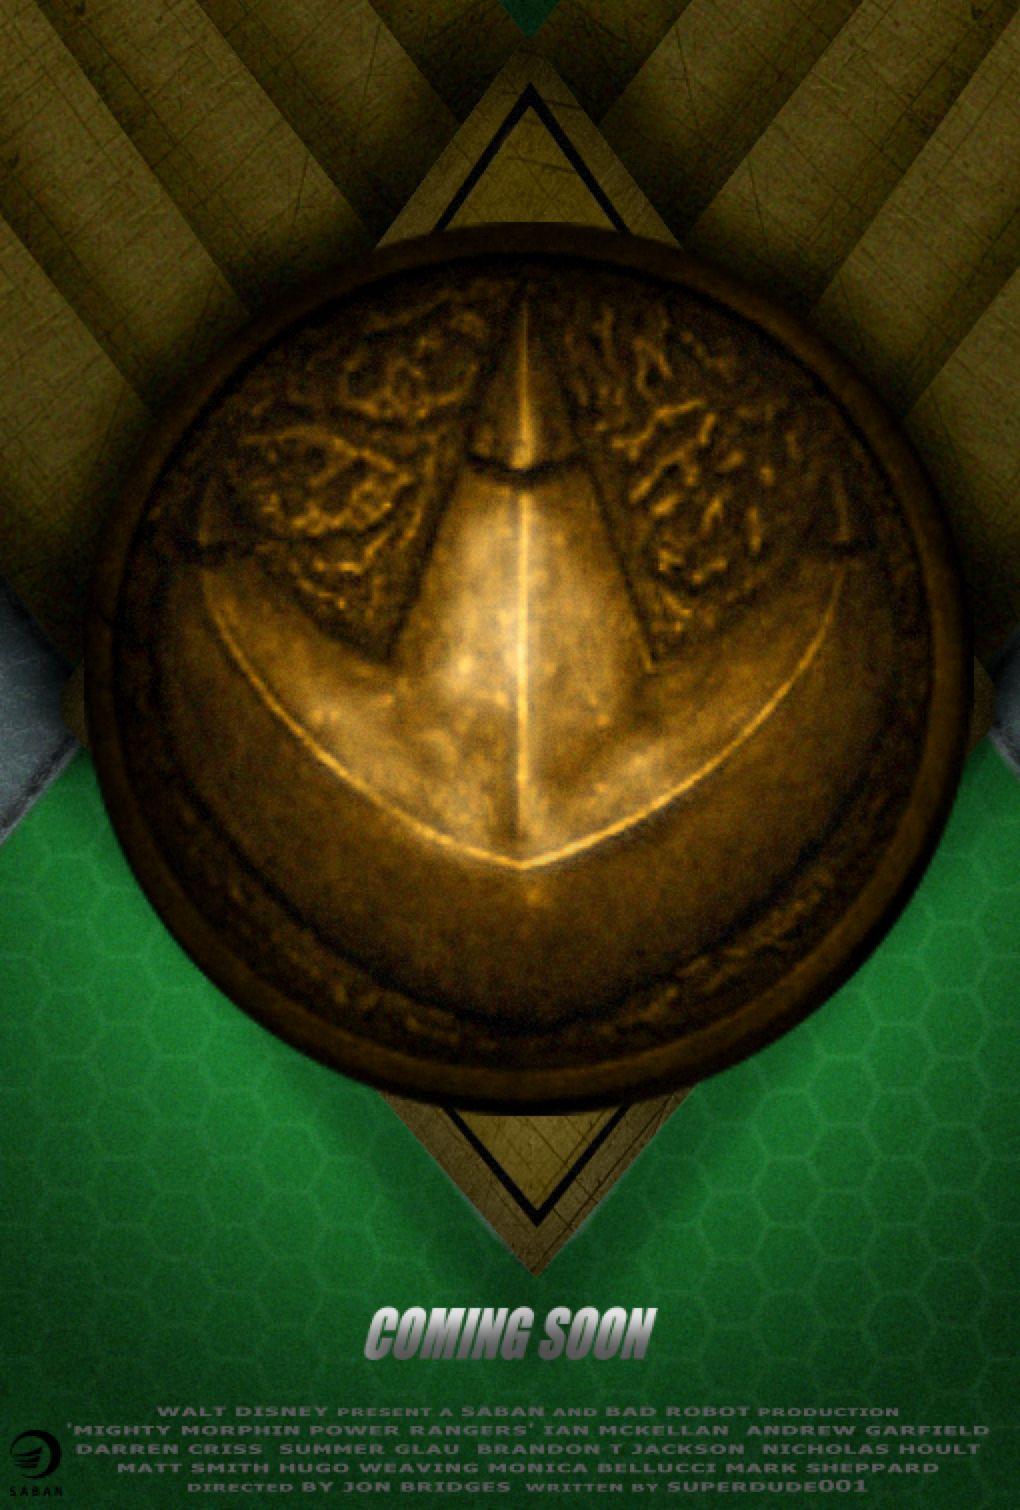 Power Rangers Wallpaper For Bedroom Mmpr Green Ranger Dragonzord Coin Iphone Wallpaper By